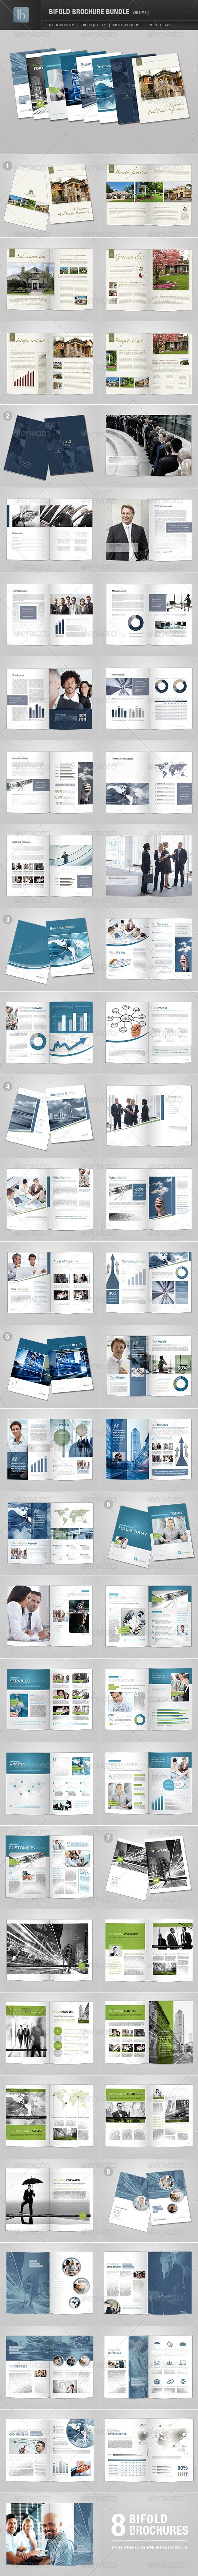 Bifold Brochure Bundle | Volume 1 - GraphicRiver Item for Sale